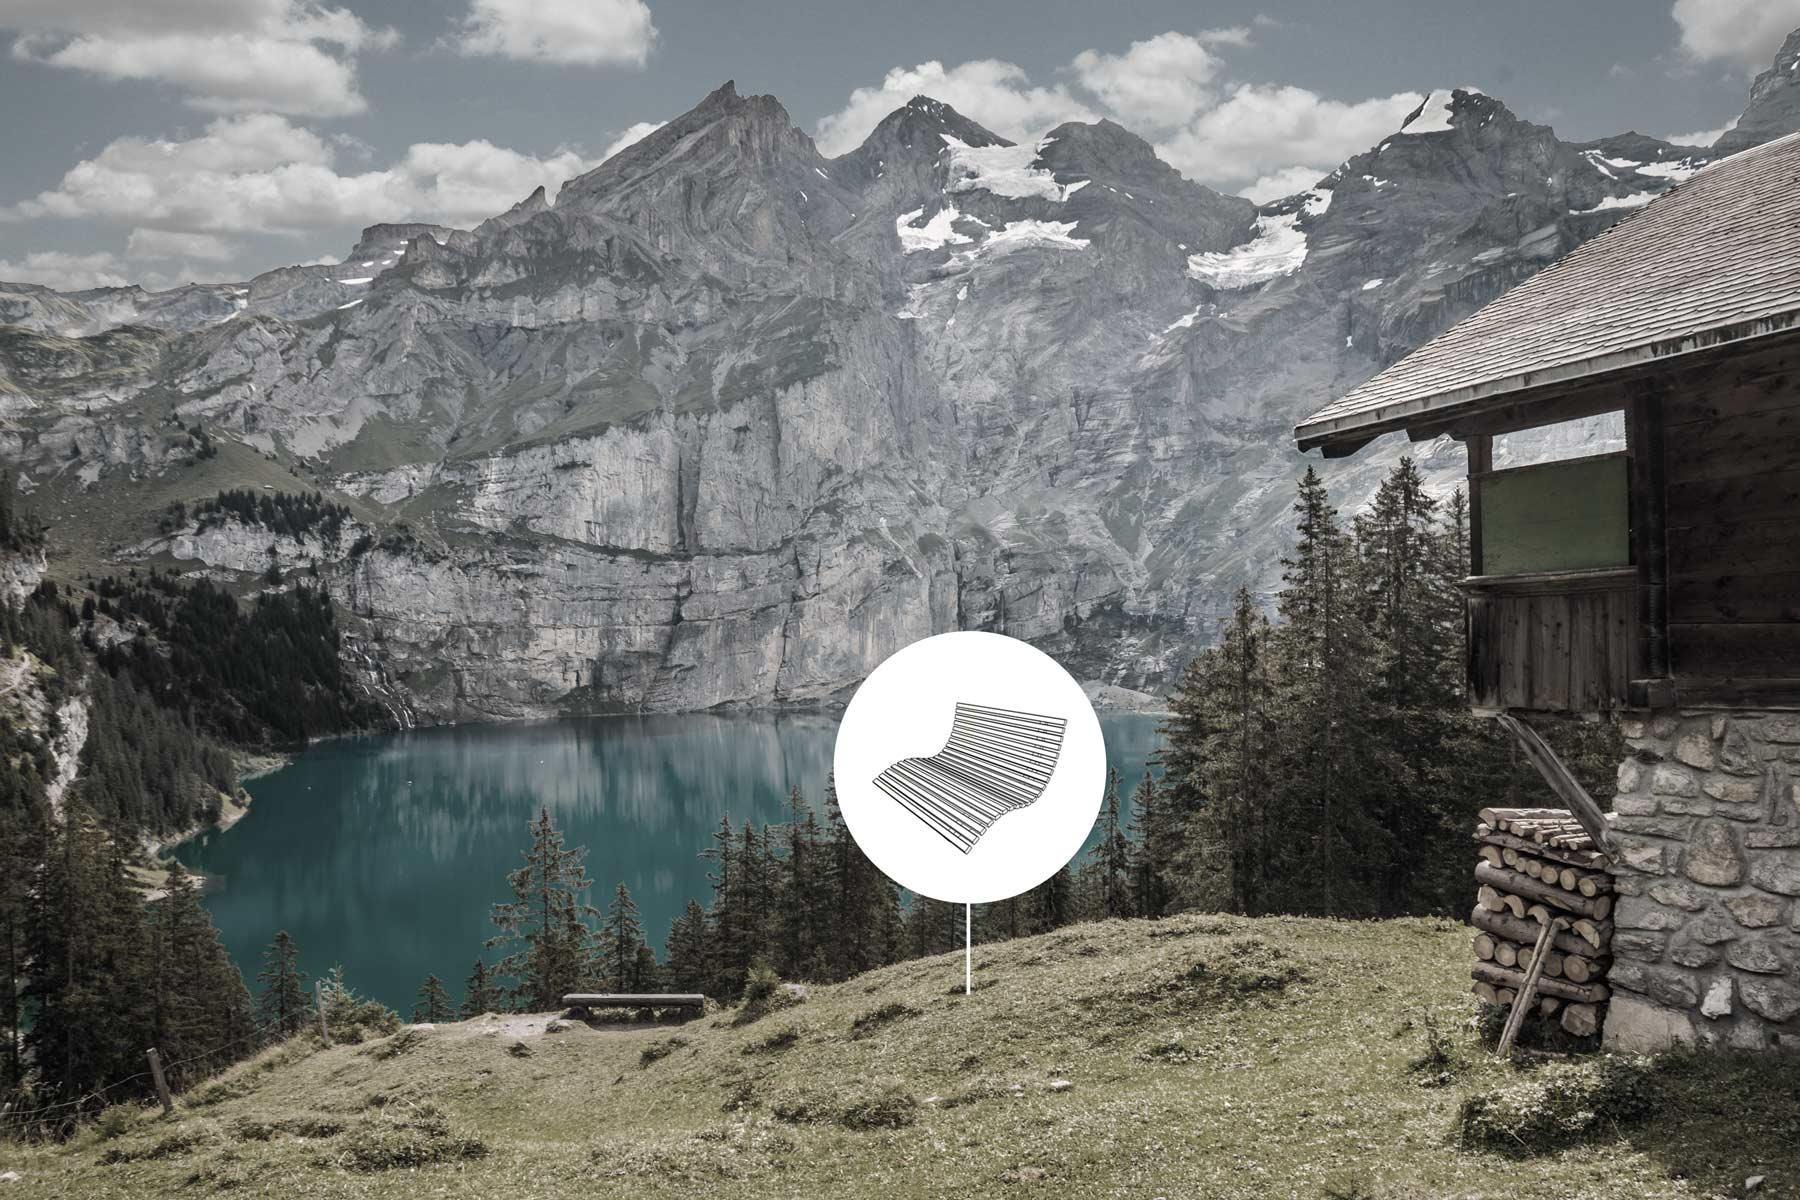 berghuette-waldliege-naturliege-hangsofa-bioliege-erdschrauben